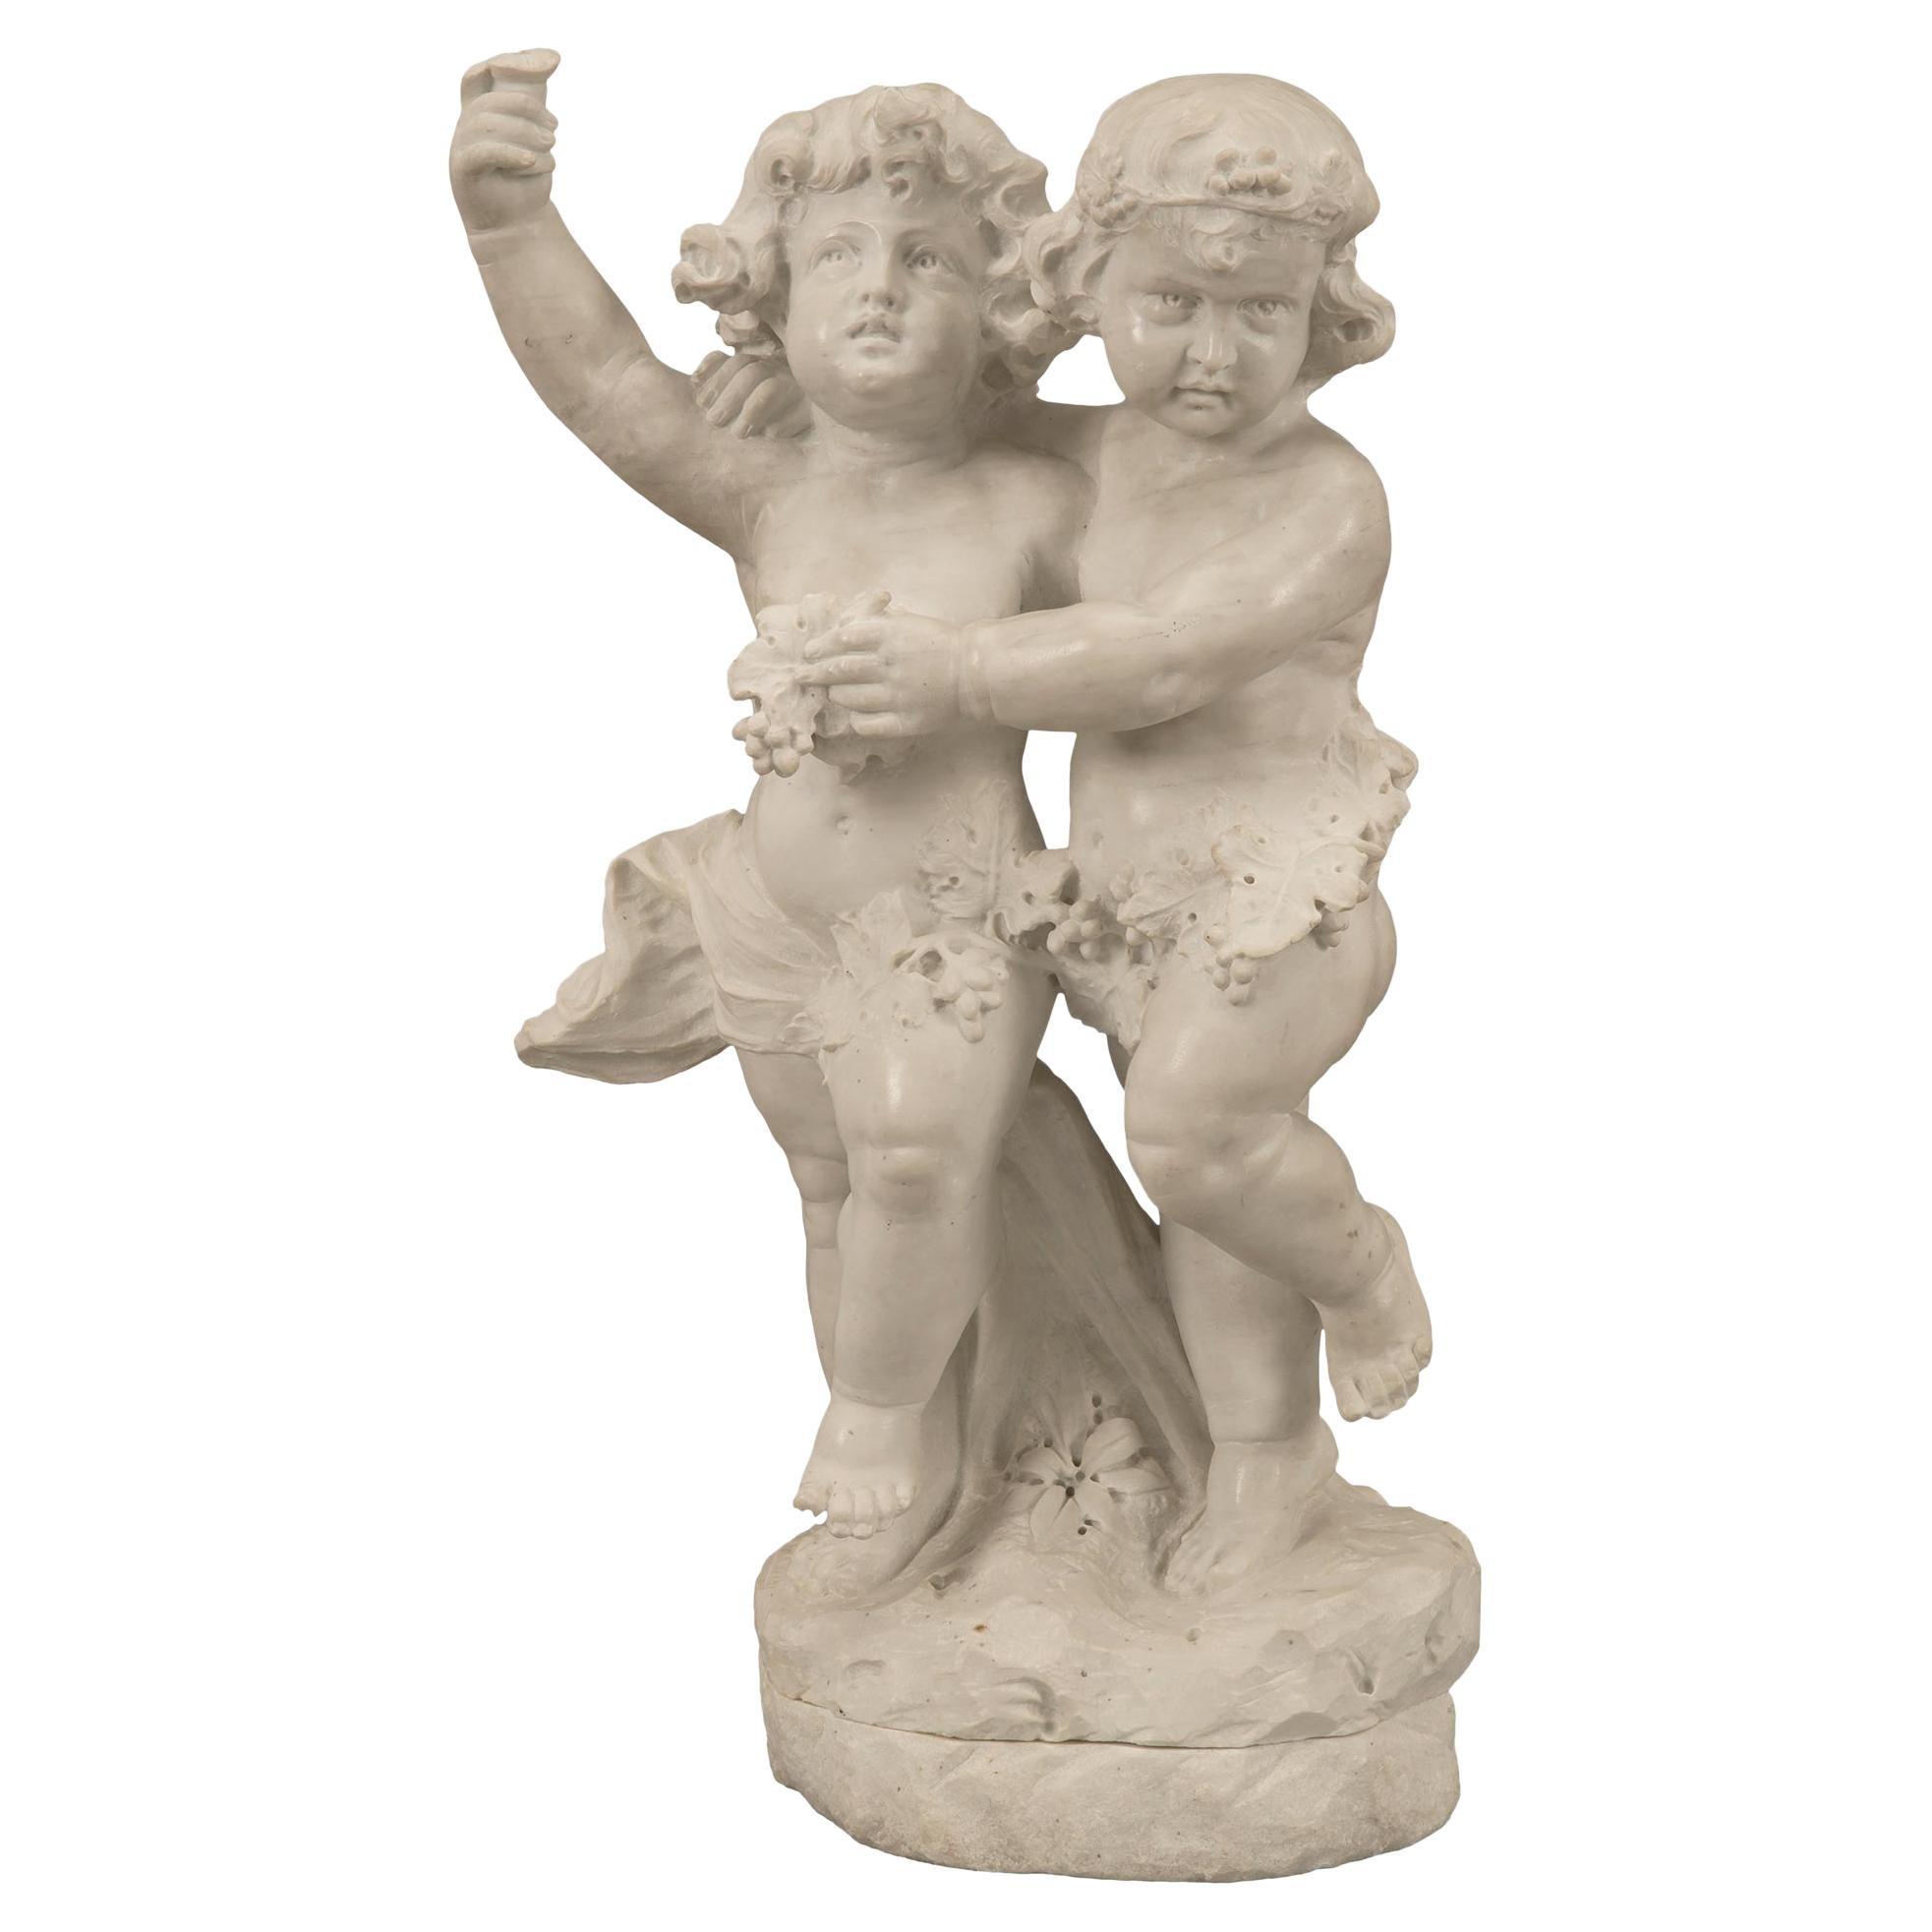 Italian 19th Century White Carrara Marble Statue of Two Children Playing